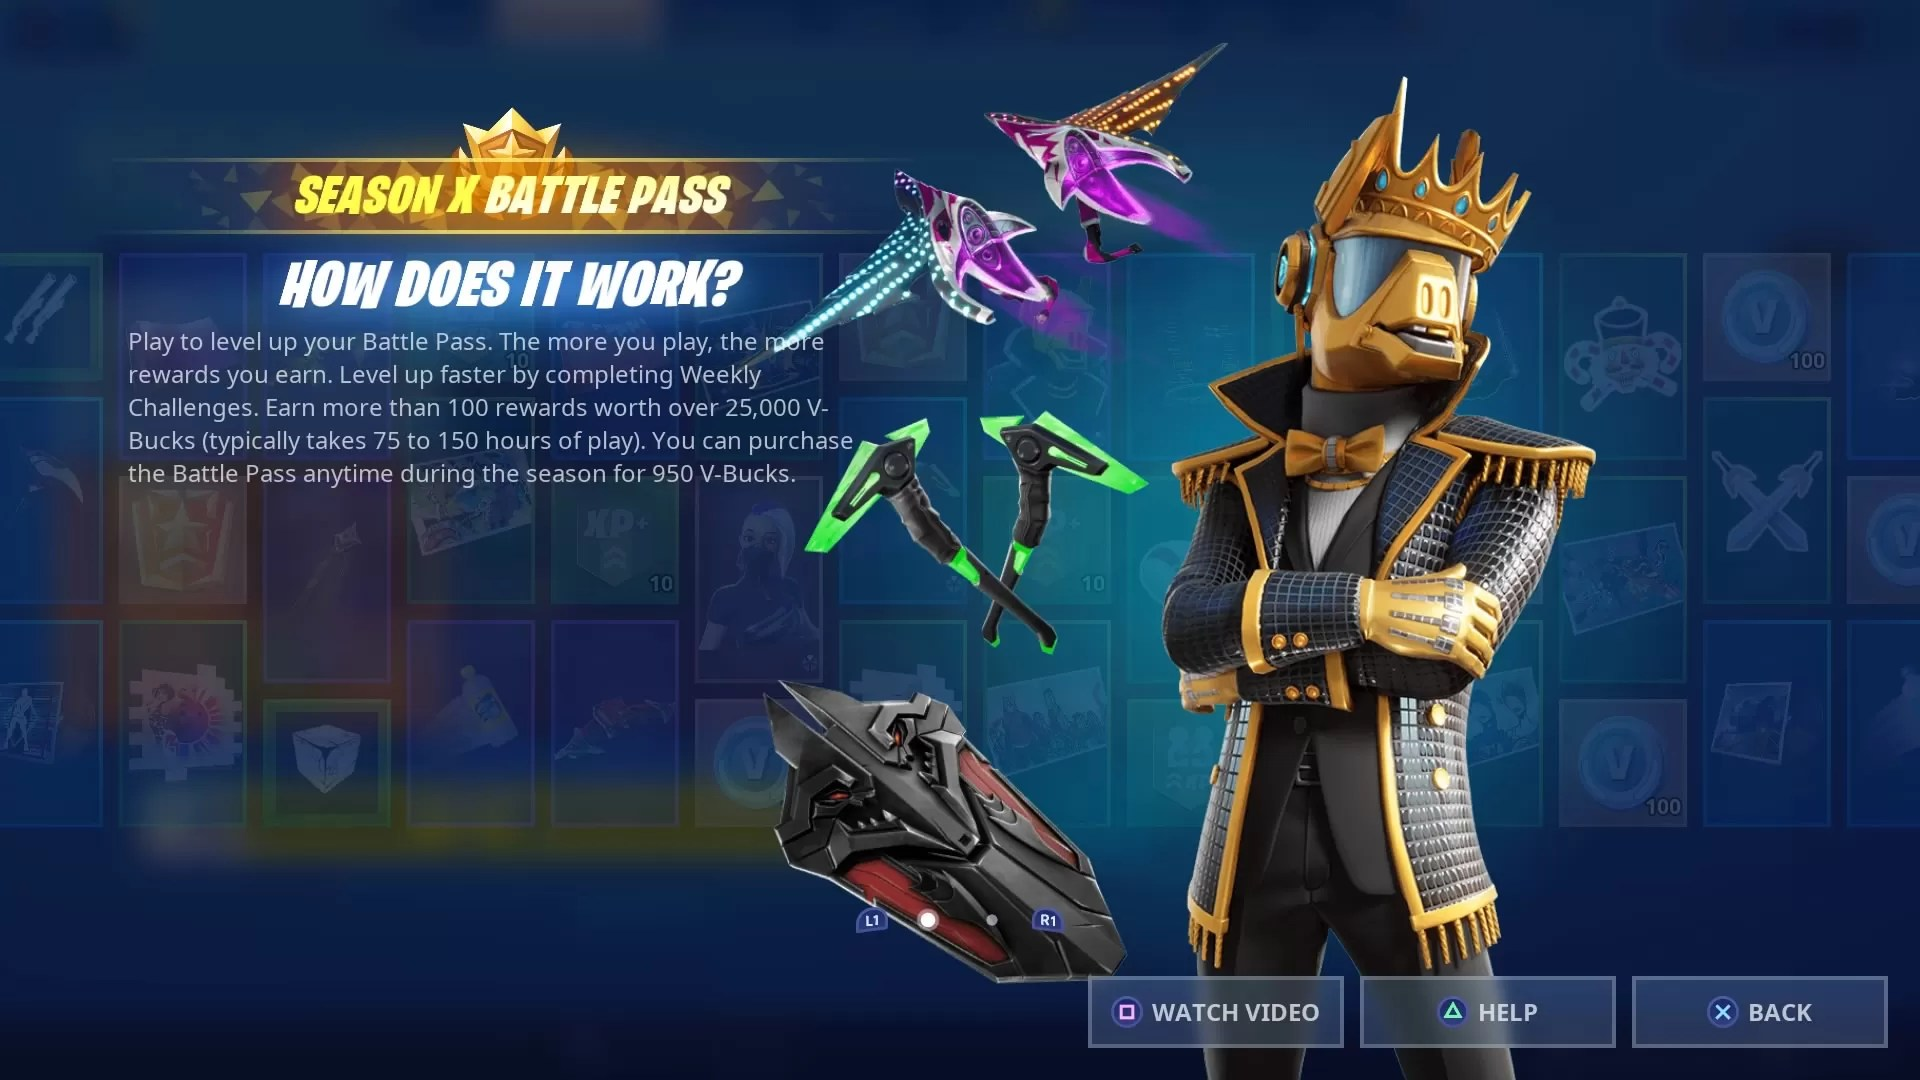 Fortnite Season X Battle Pass Gameshedge